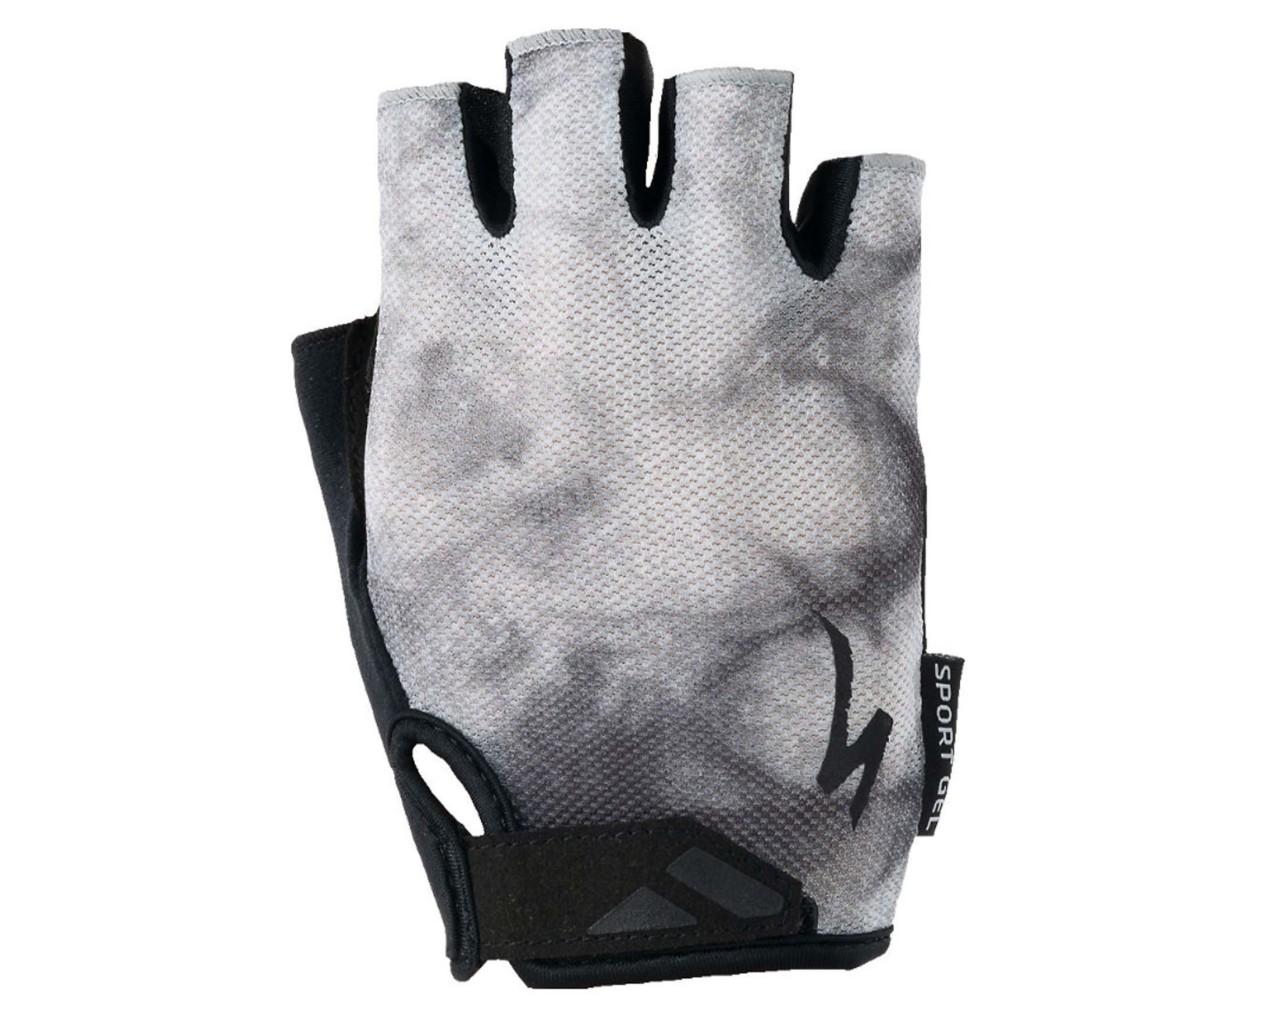 Specialized BG Sport Gel Damen Handschuhe kurzfinger | dove grey marbled